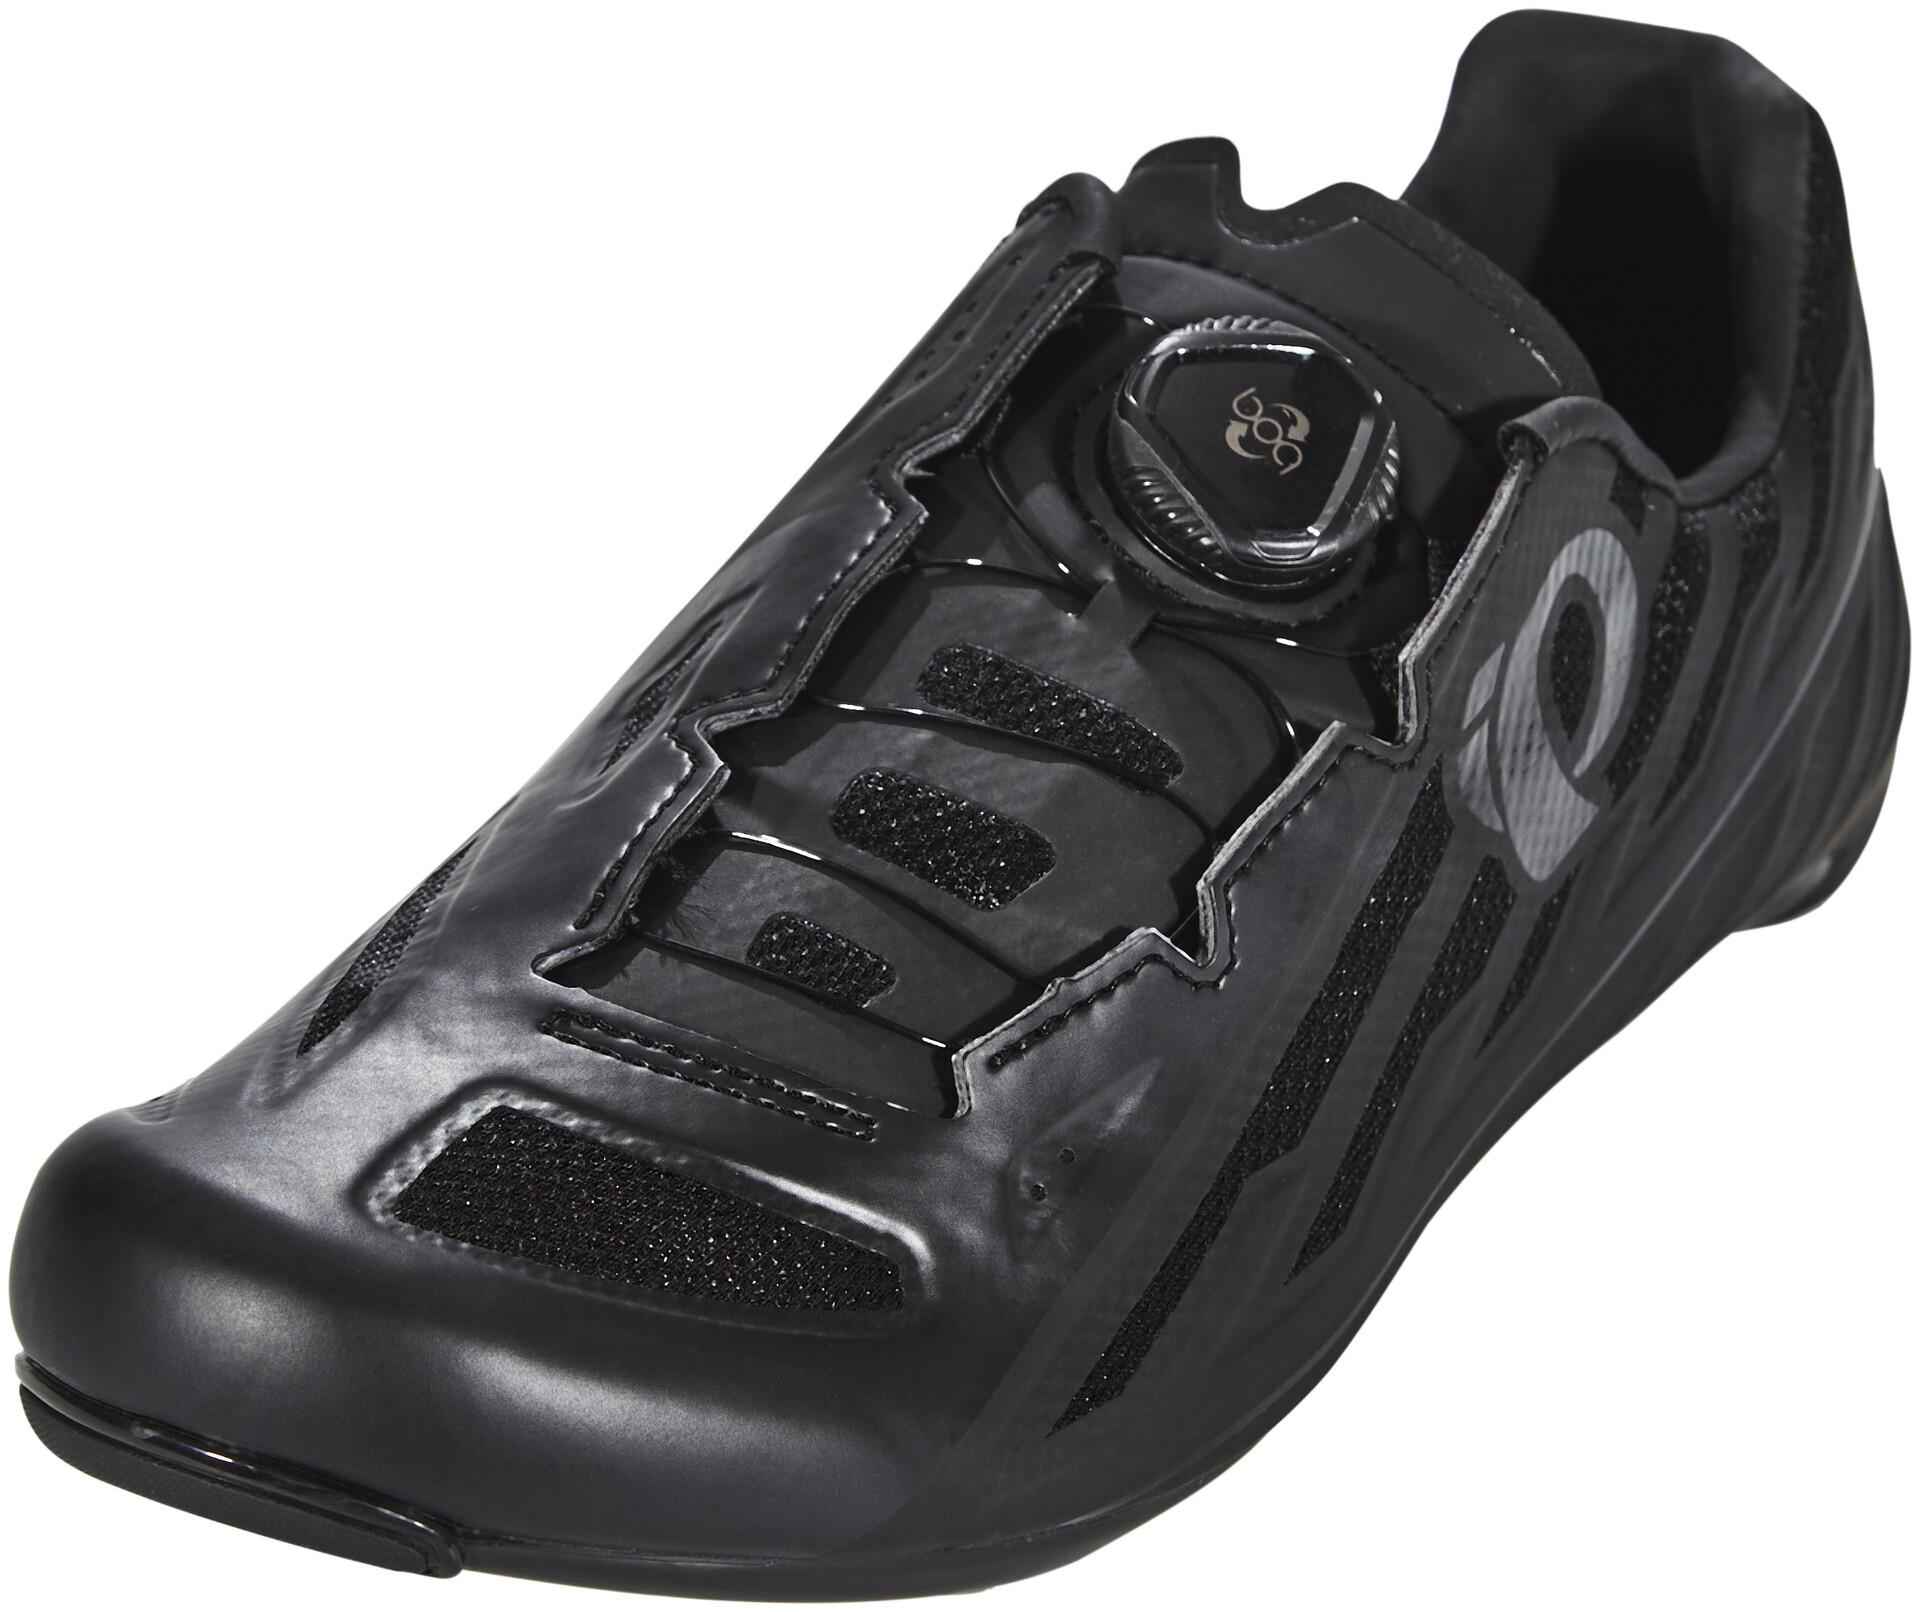 Pi Road Iii Izumi Shoes Race Black Pearl UzSqMVpG